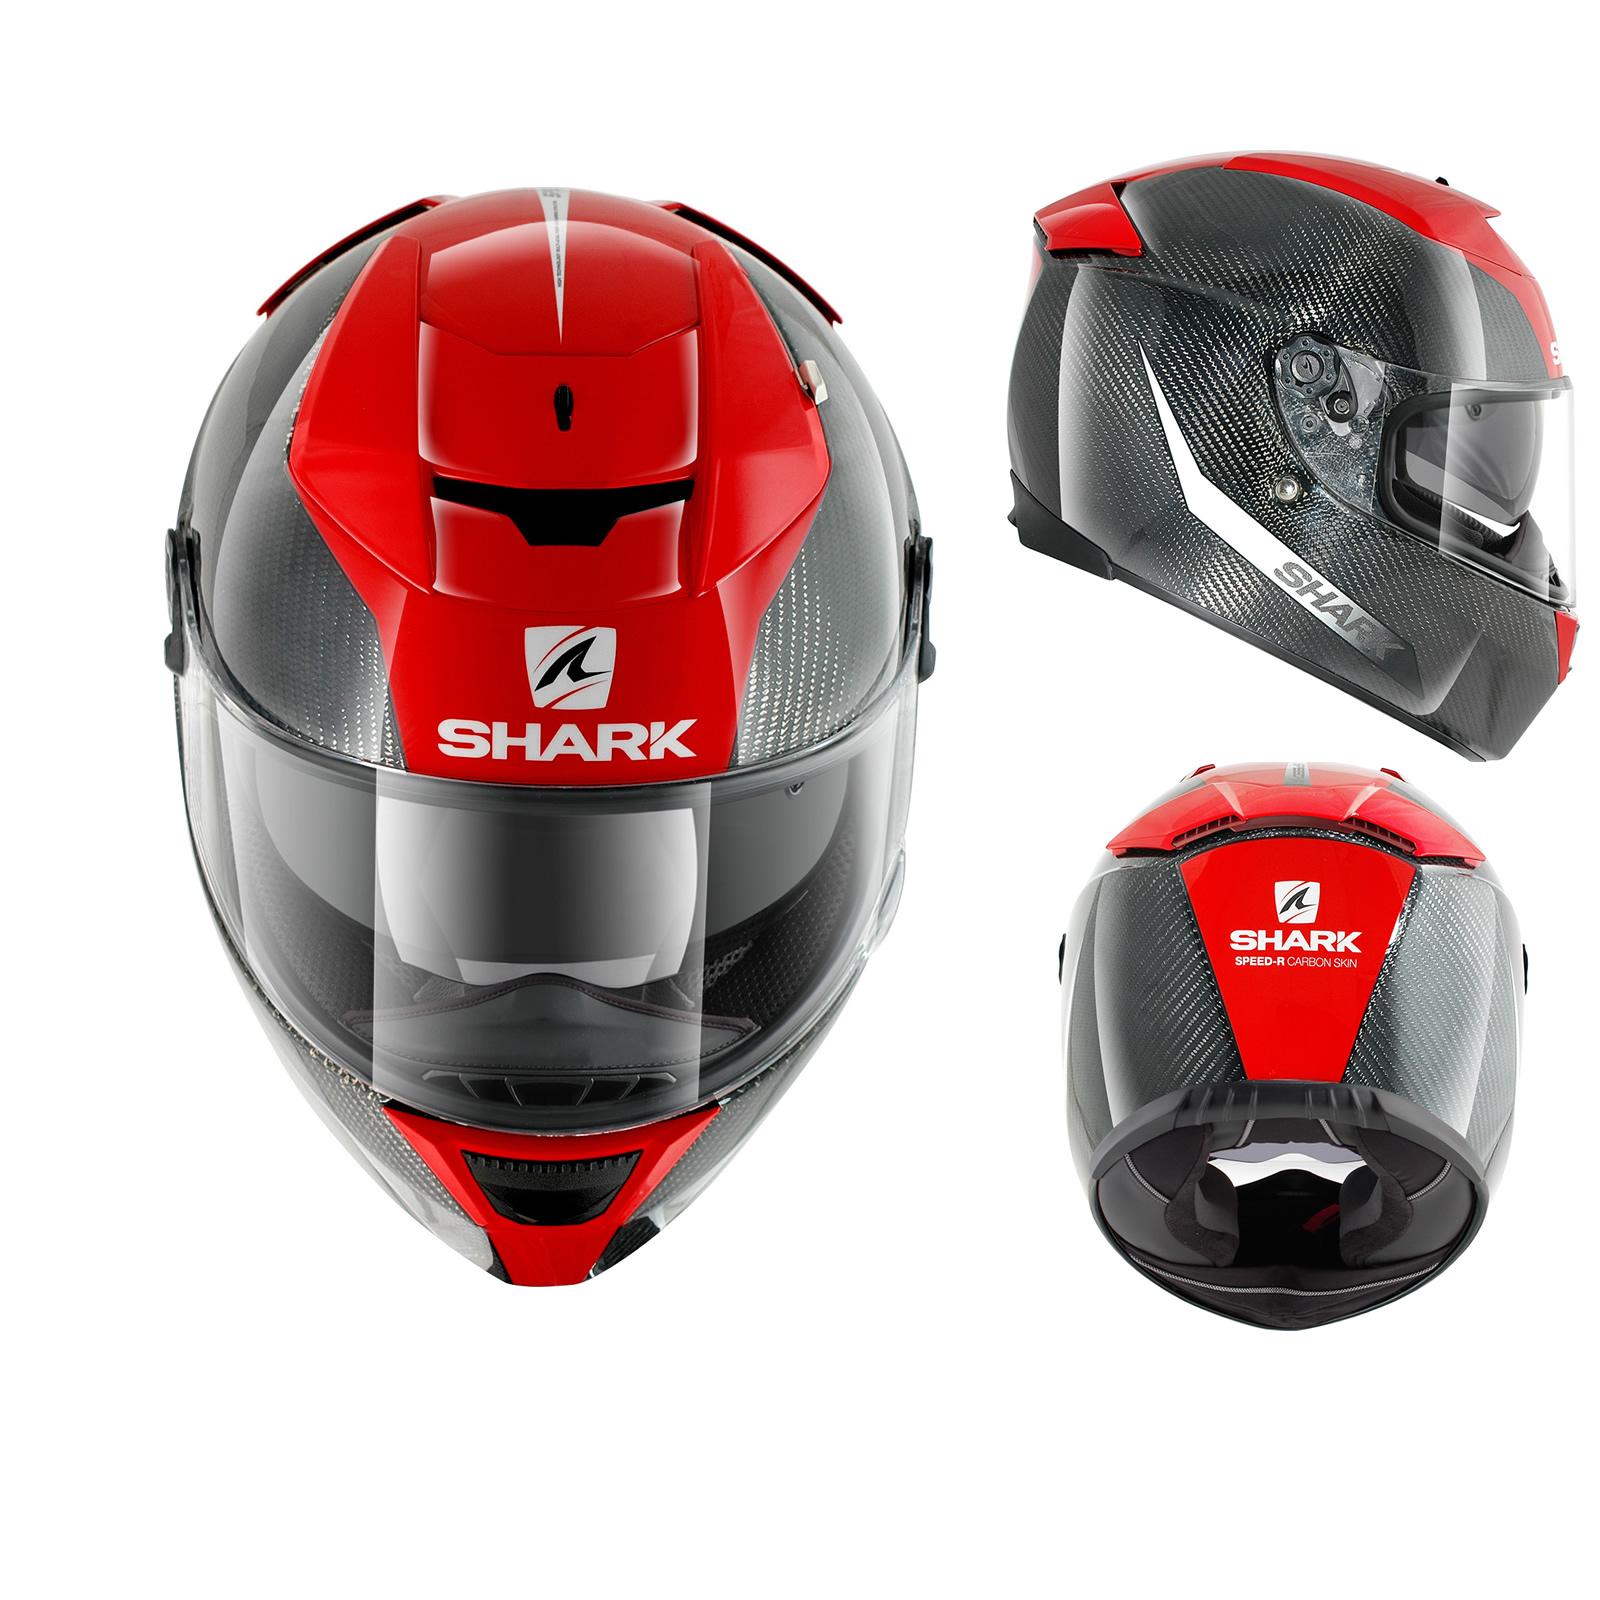 shark speed r carbon fibre skin internal sun visor full face motorcycle helmet ebay. Black Bedroom Furniture Sets. Home Design Ideas